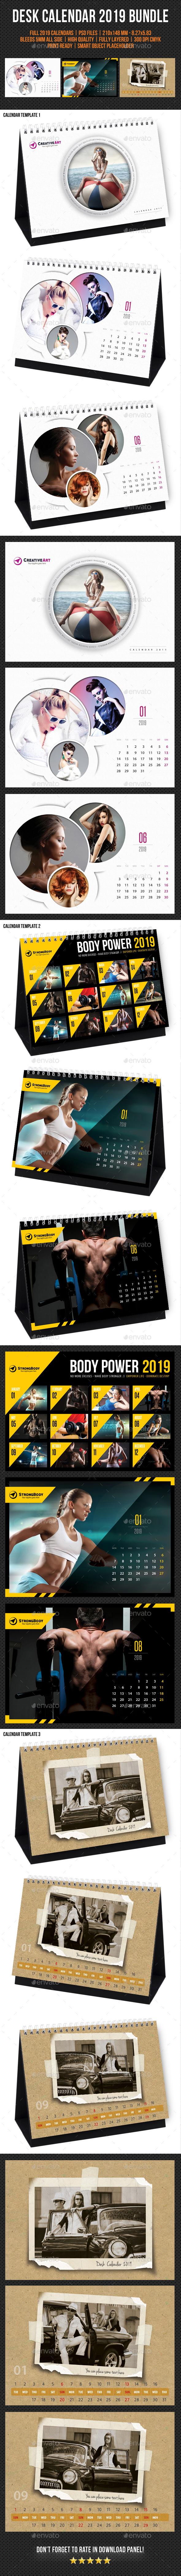 Creative Desk Calendar 2019 Bundle 09 - Calendars Stationery